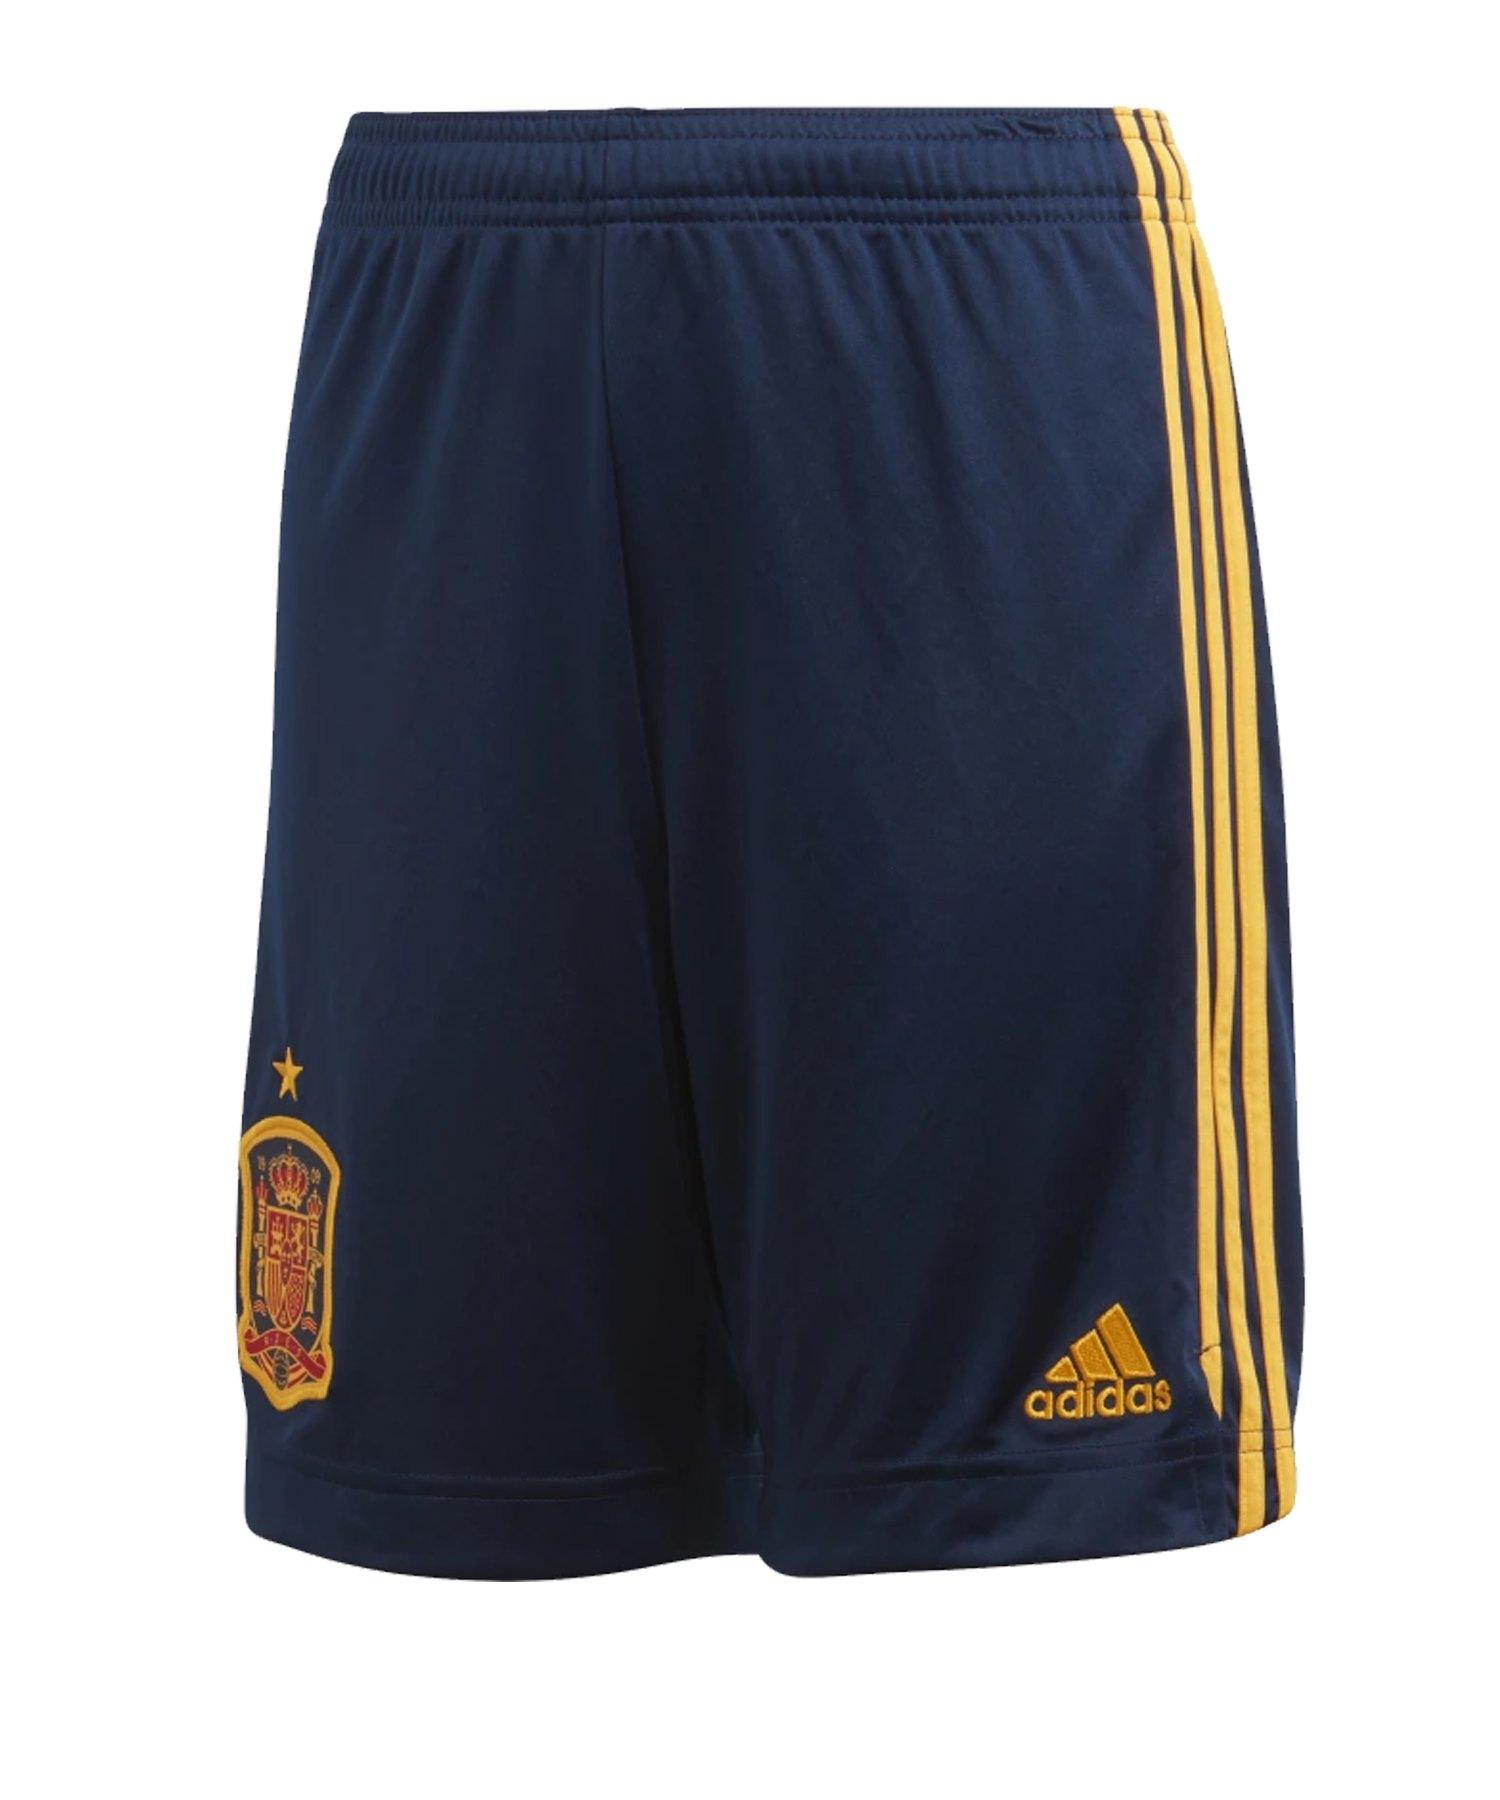 adidas Spanien Short Home EM 2020 Blau - blau